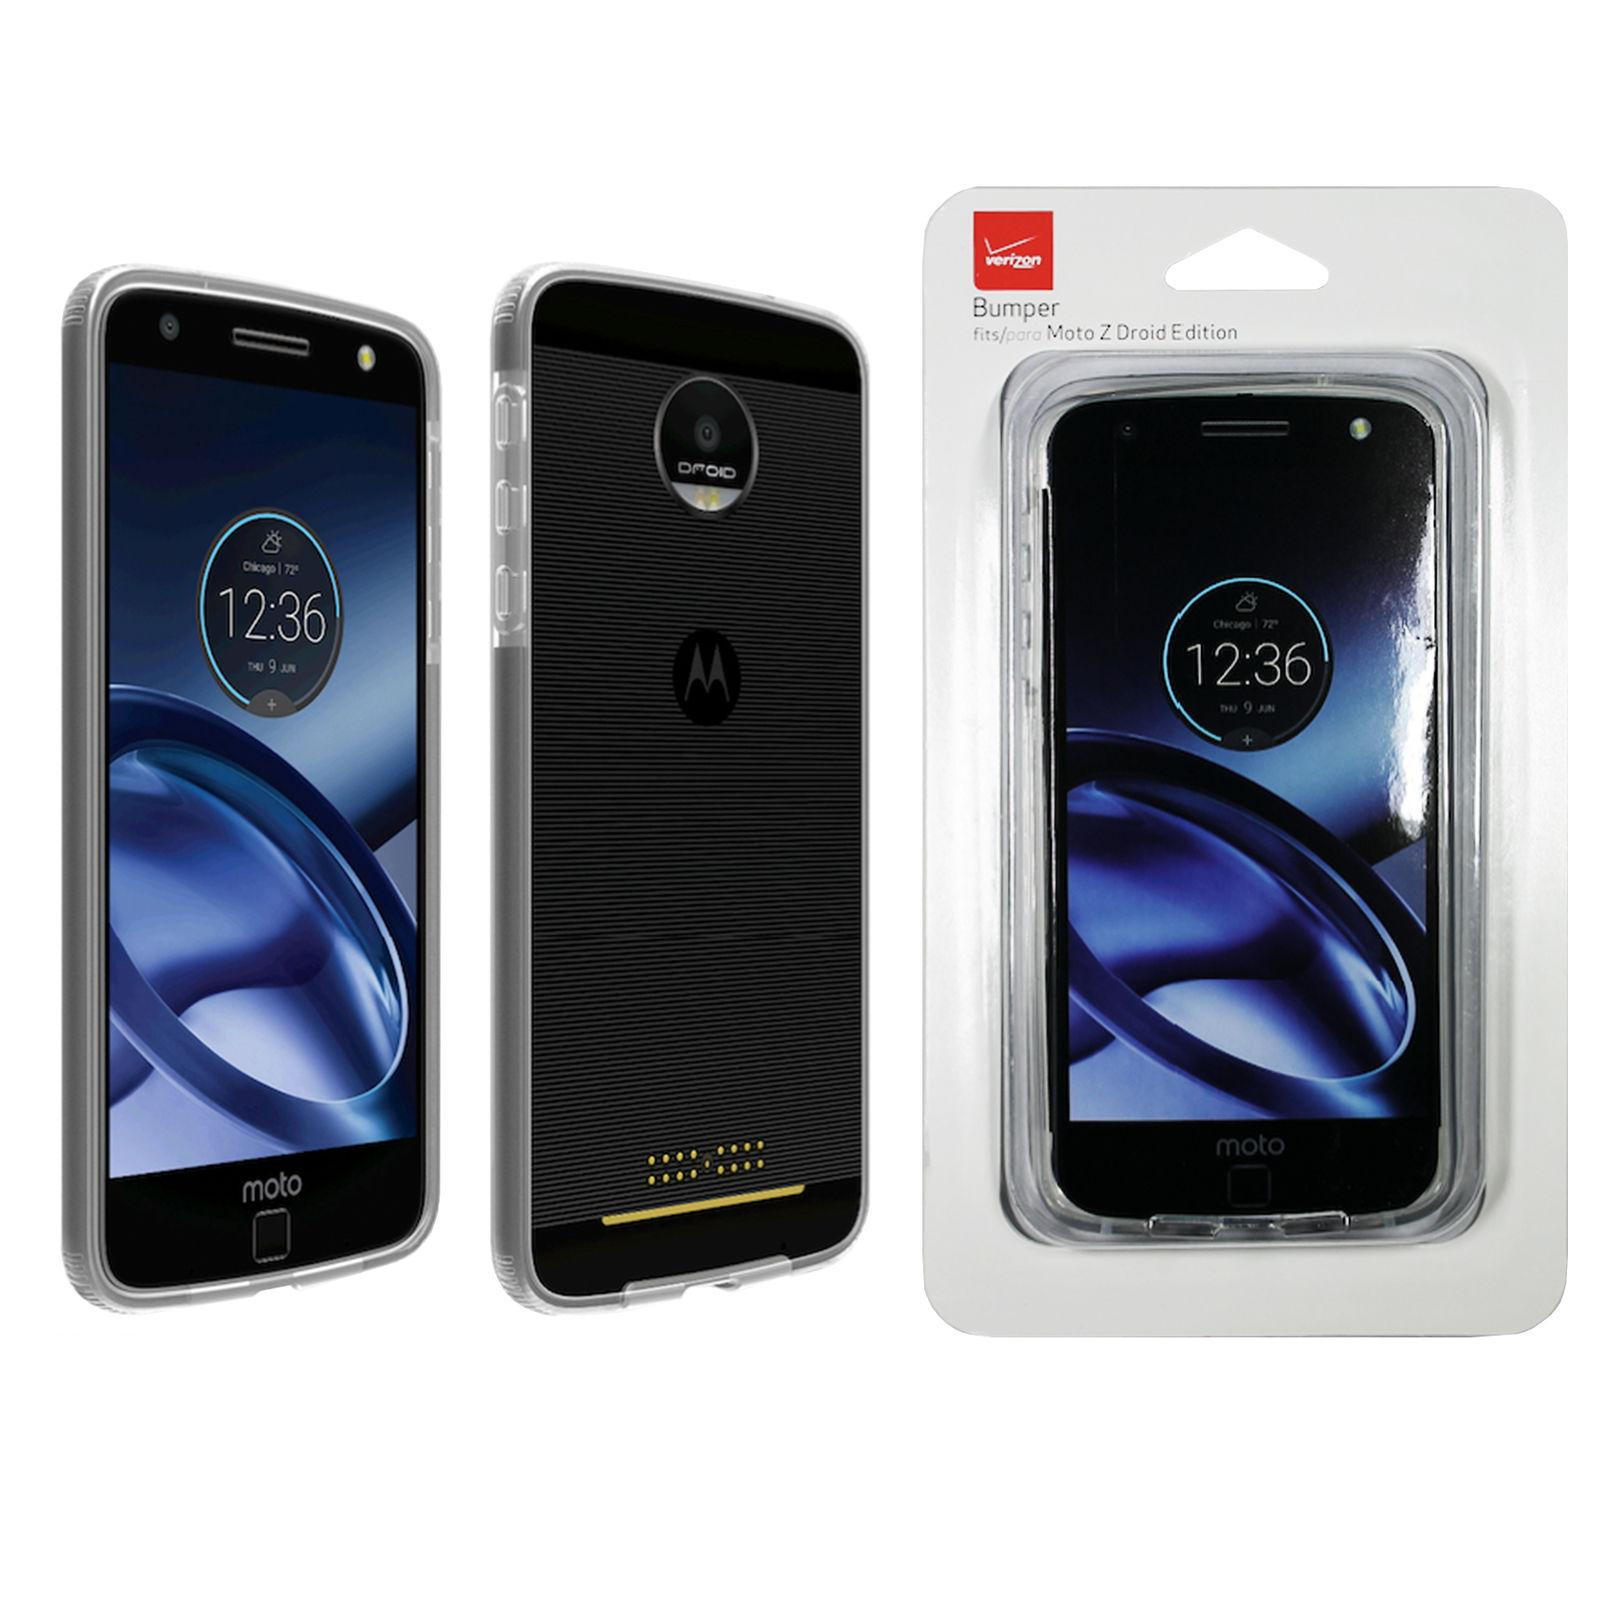 Verizon Matte Silicone Cover Case for Motorola Moto Z/Moto Z droid - Black